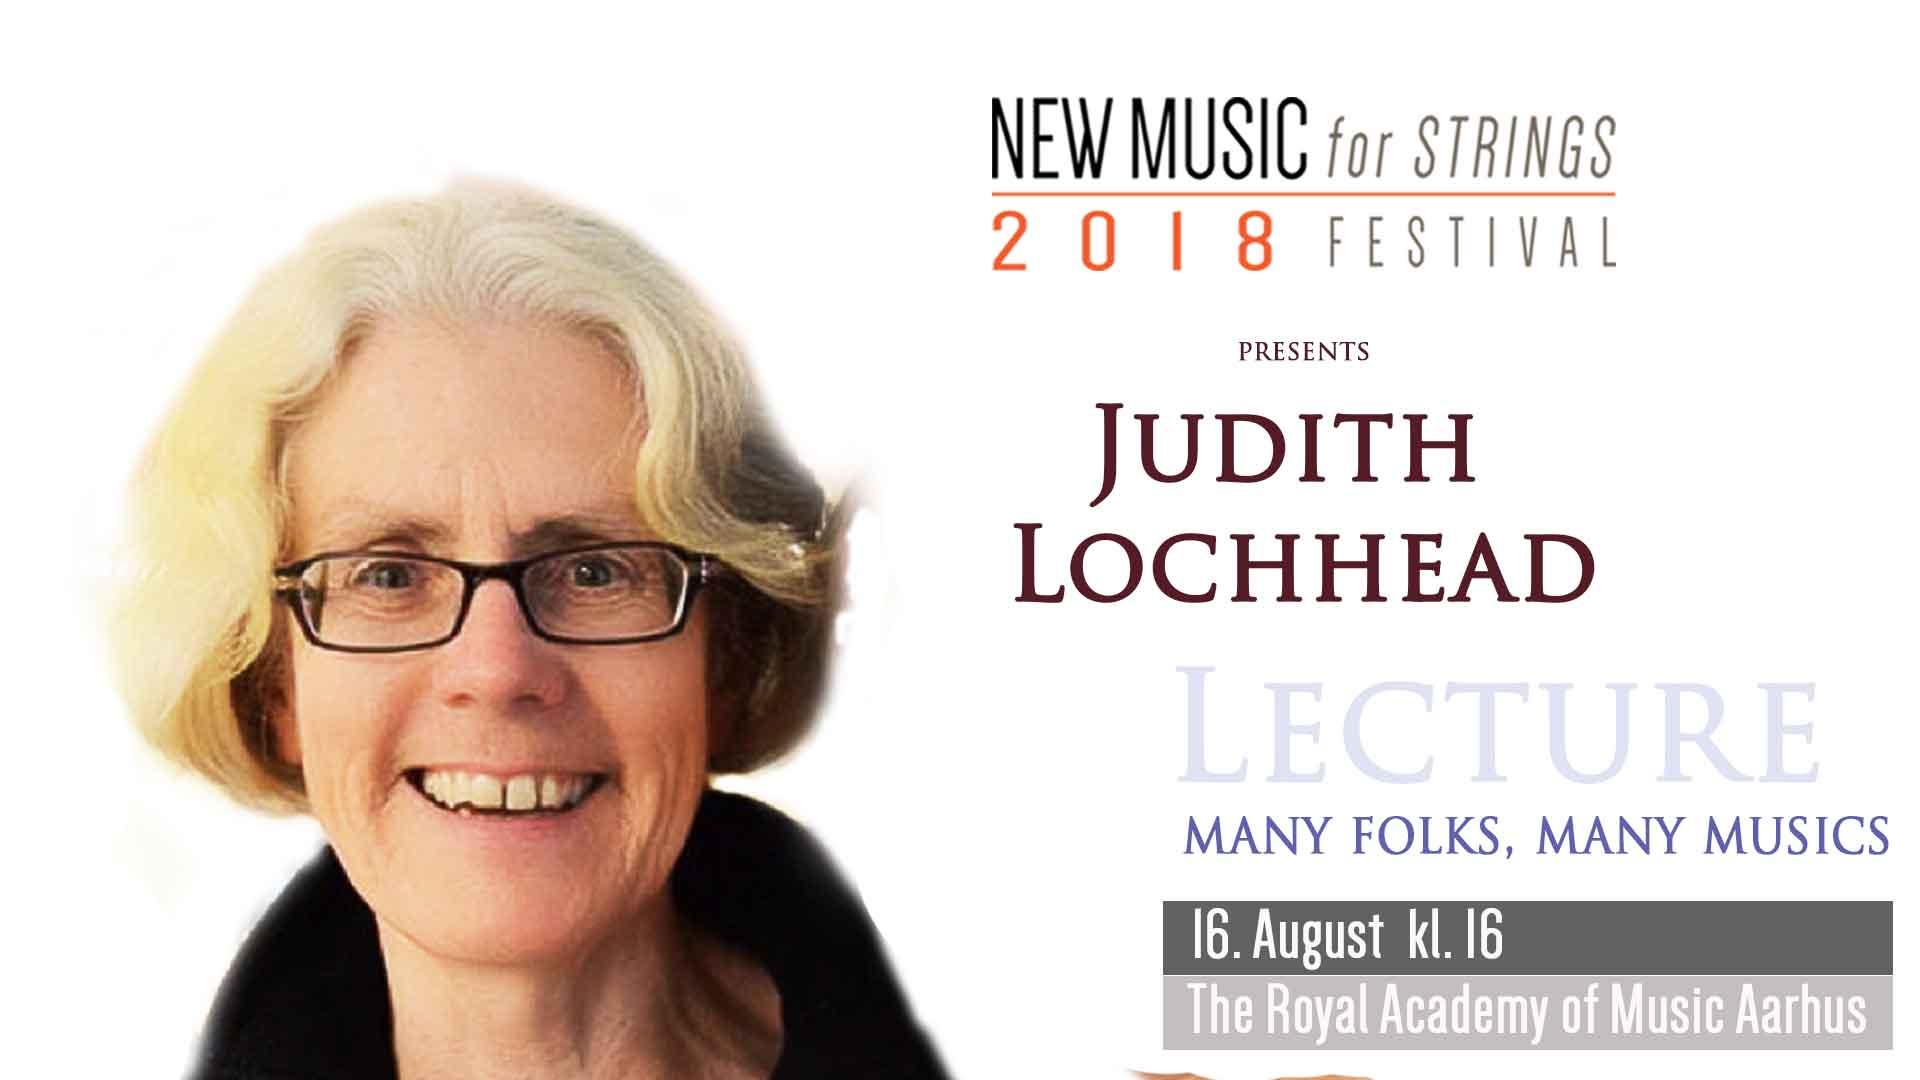 JudithLochhead_lecture_NMFS.jpg